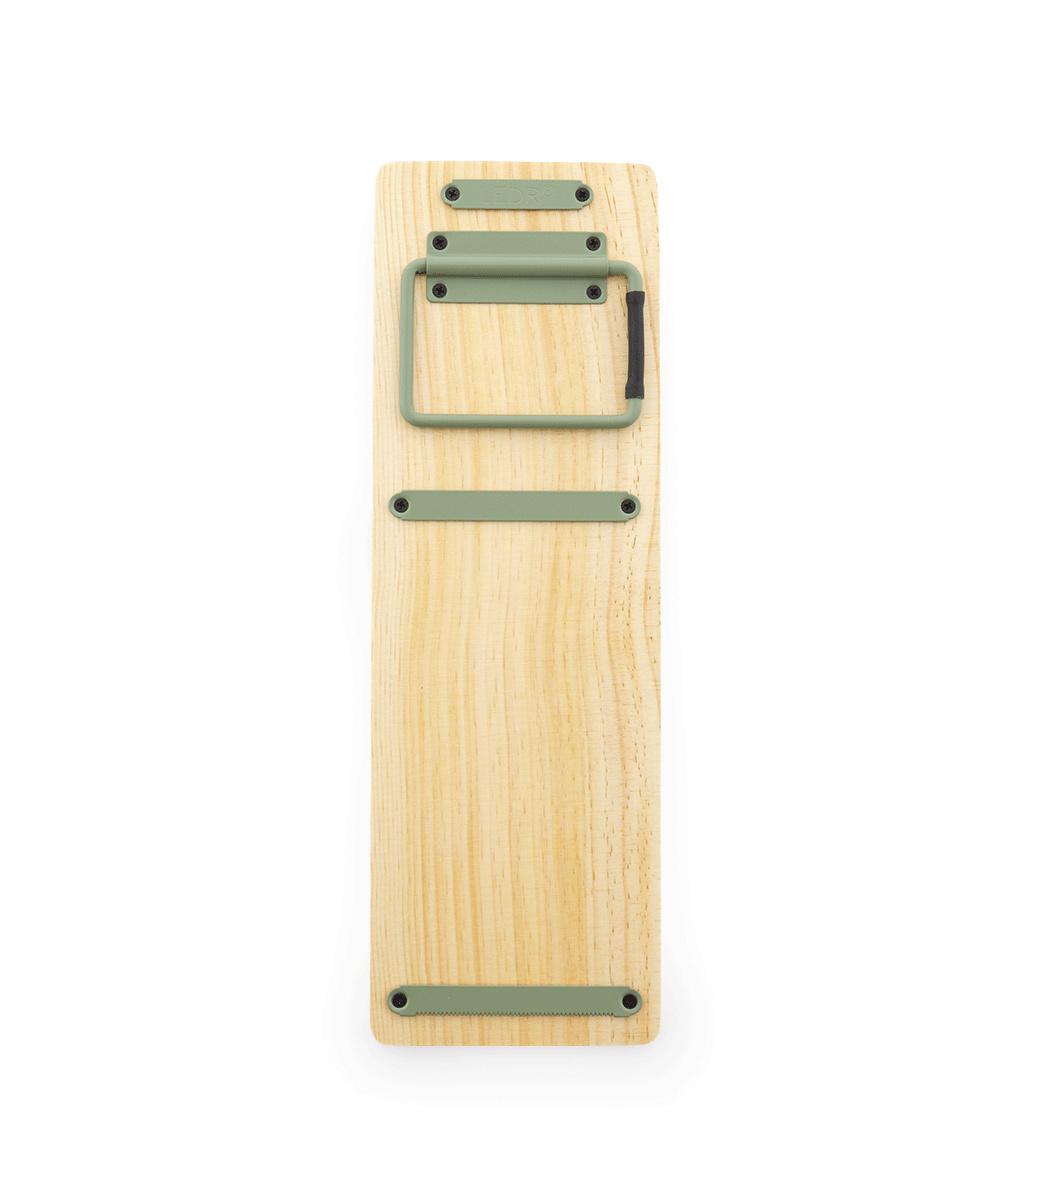 Kraft Paper Roller S - Groen-5